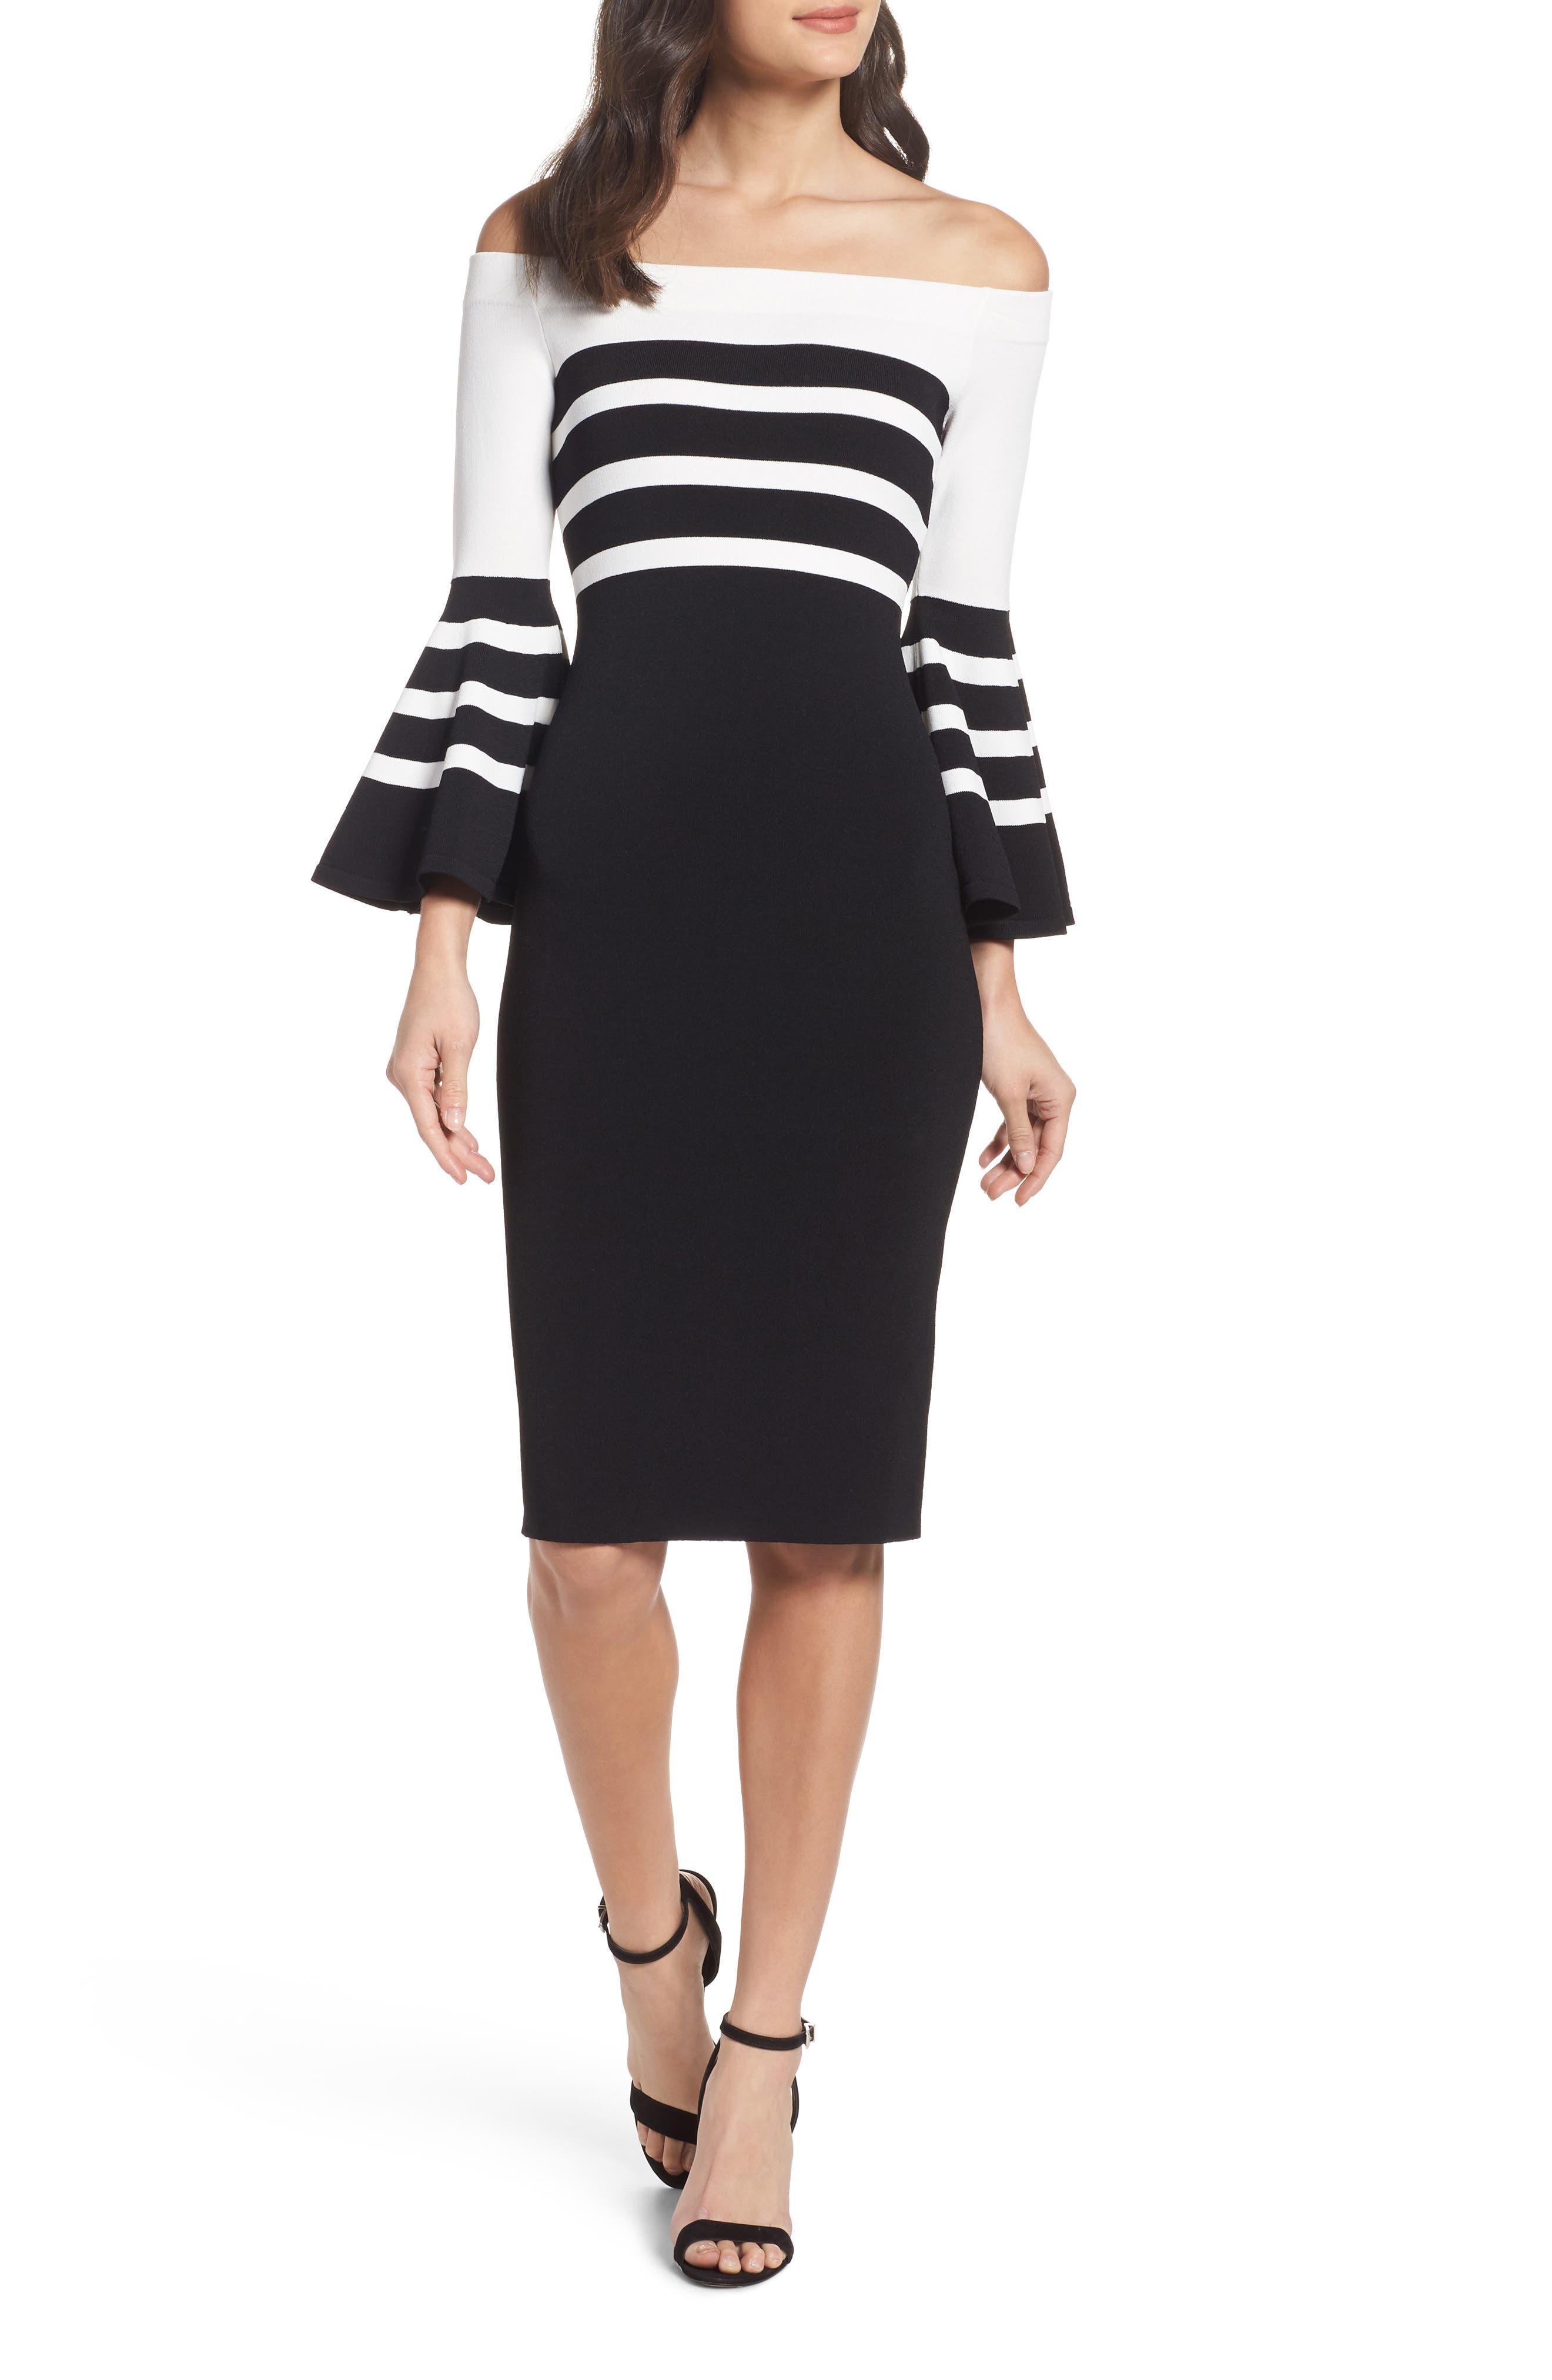 Alternate Image 1 Selected - Chelsea28 Off the Shoulder Sweater Dress